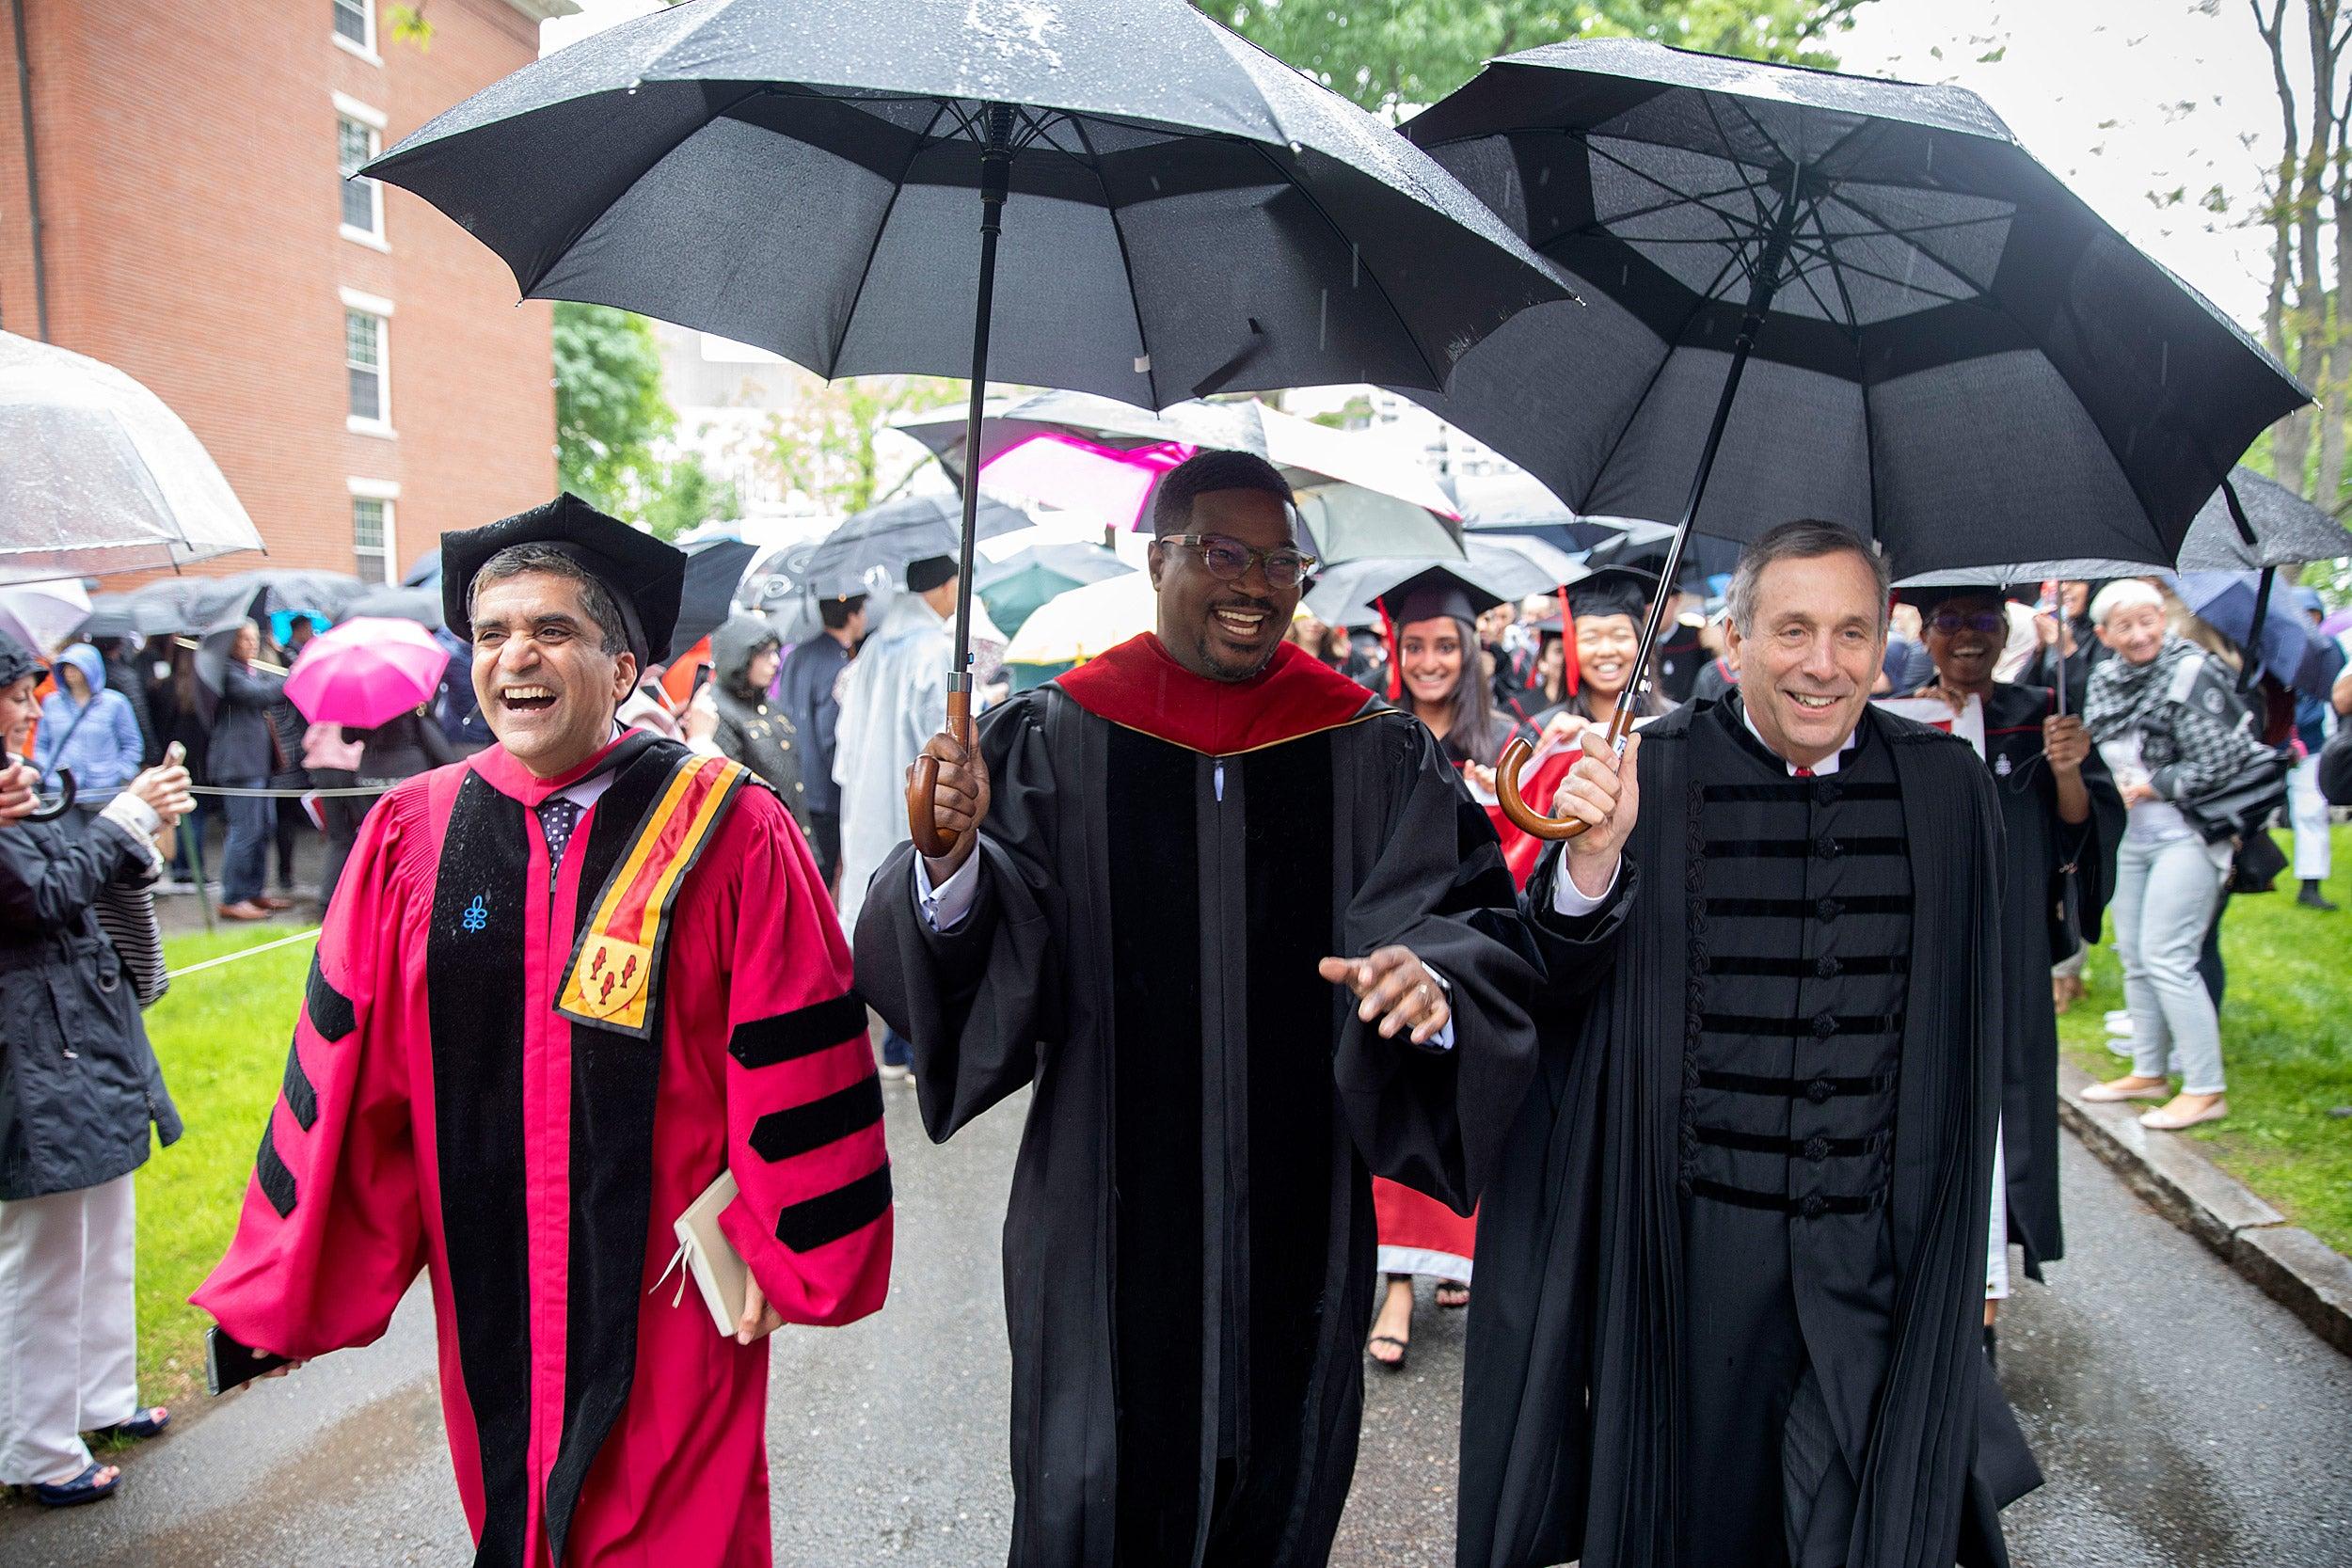 Rakesh Khurana, Jonathan Walton, and Larry Bacow lead the procession.